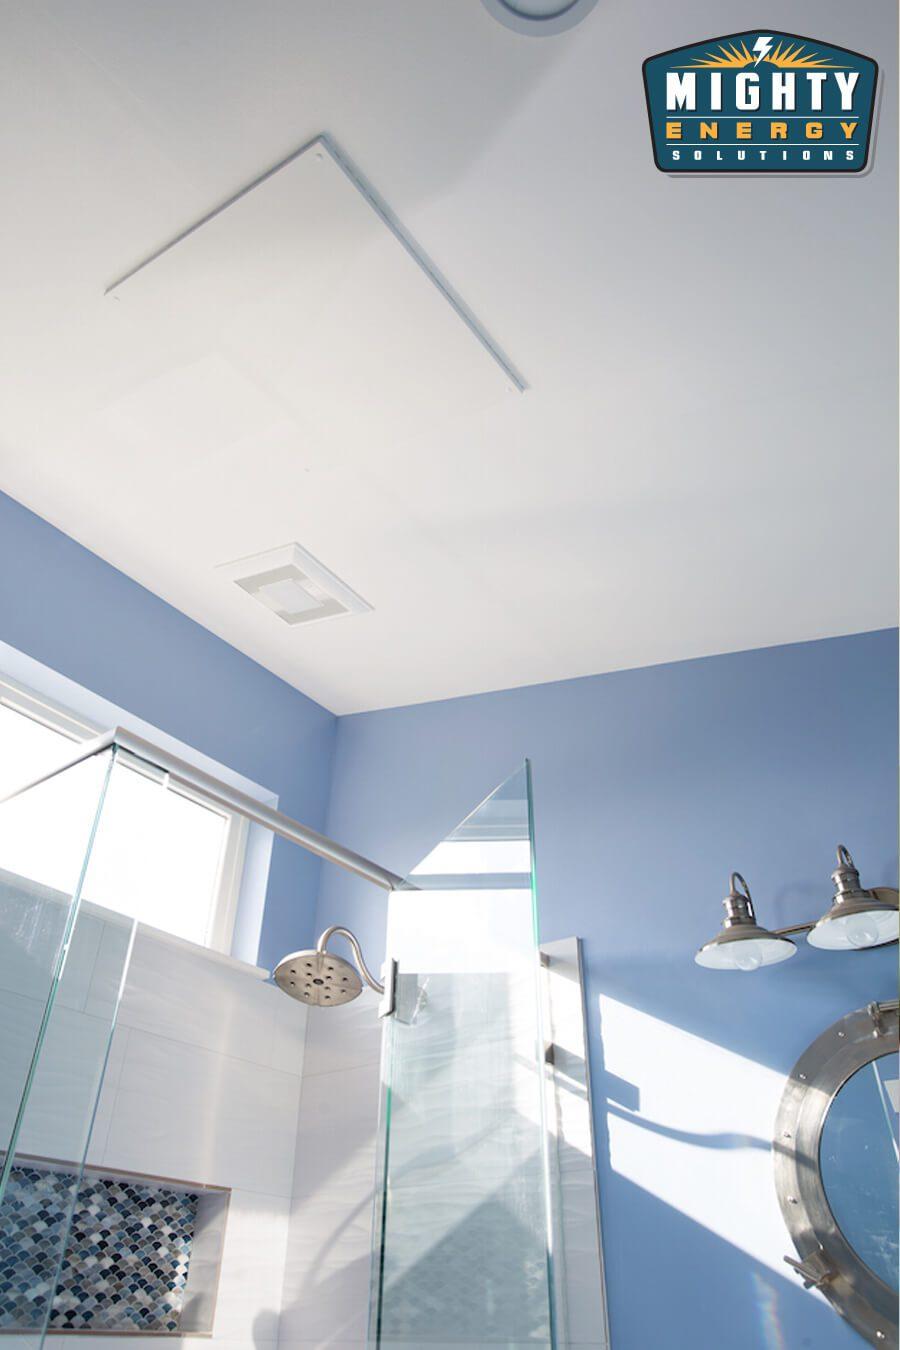 Ducoterra Radiant Ceiling Heating Panel